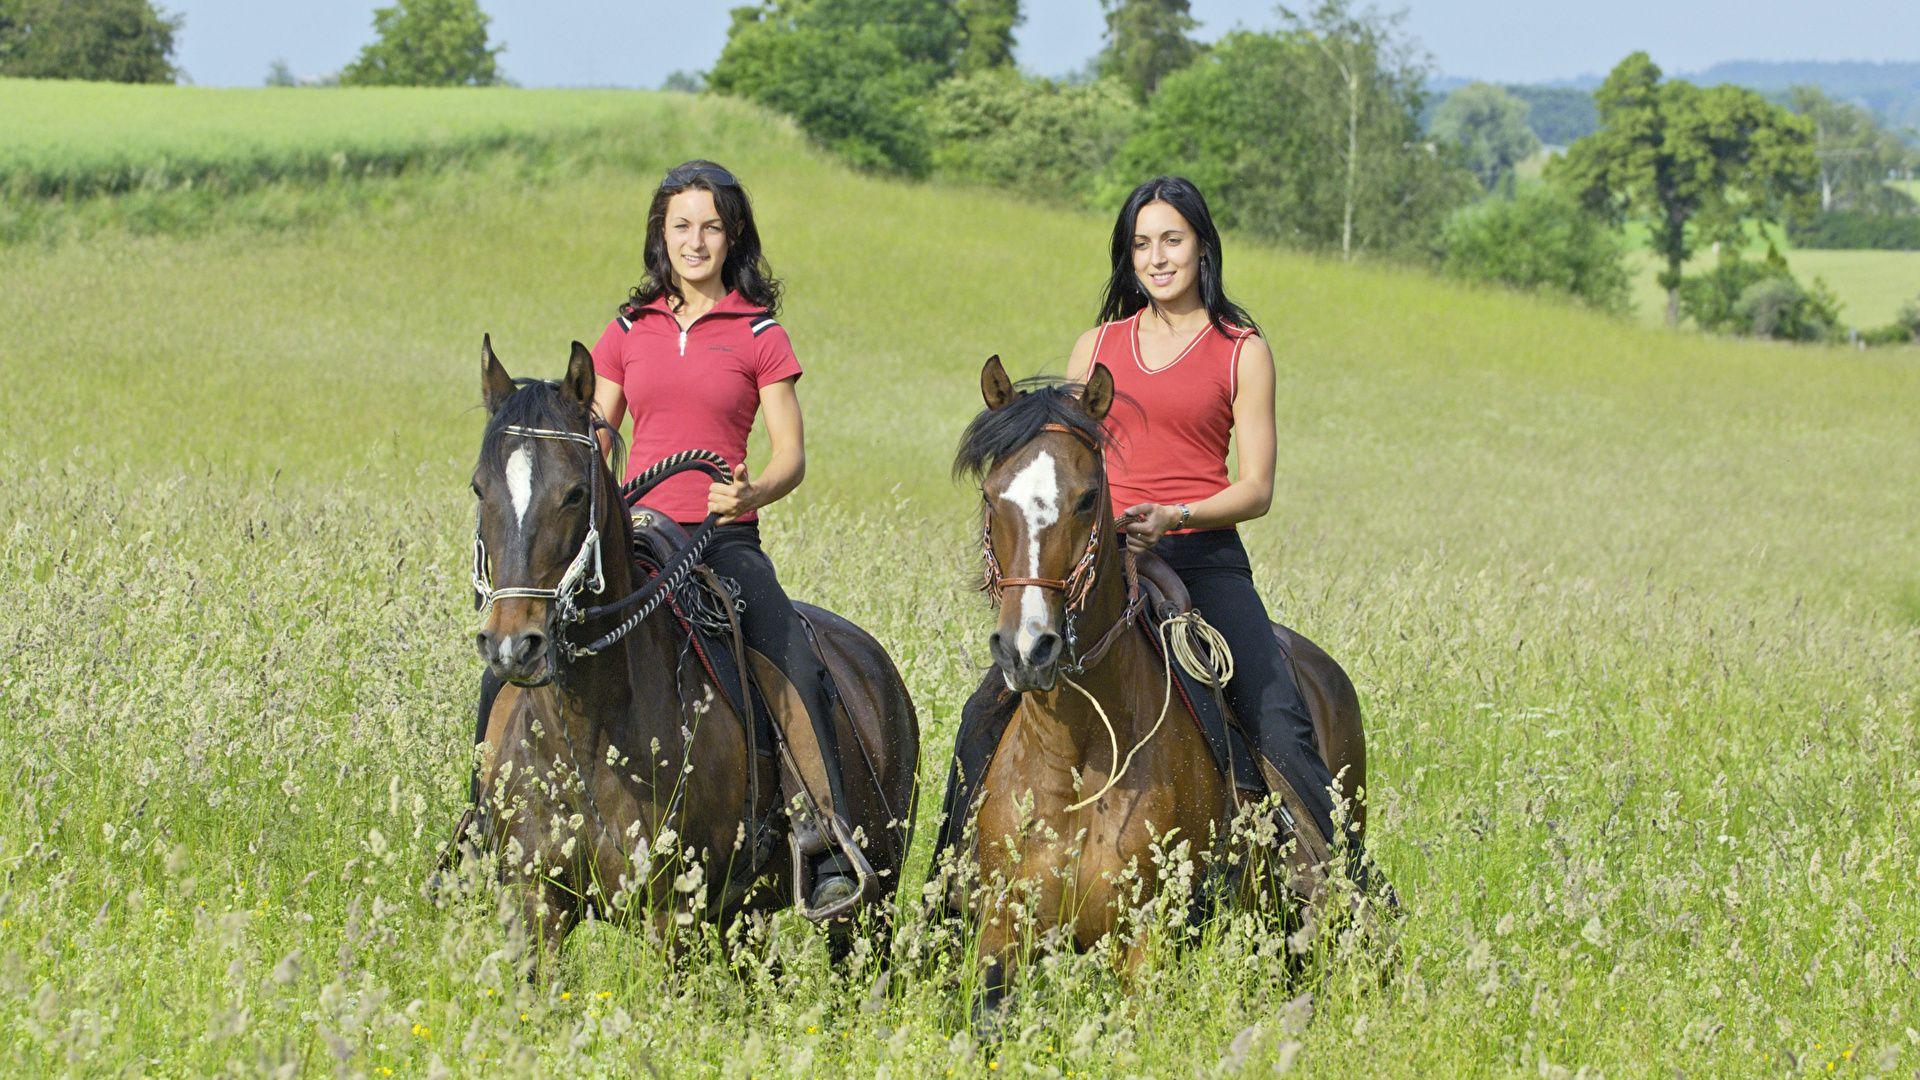 Equestrian full hd wallpaper for laptop